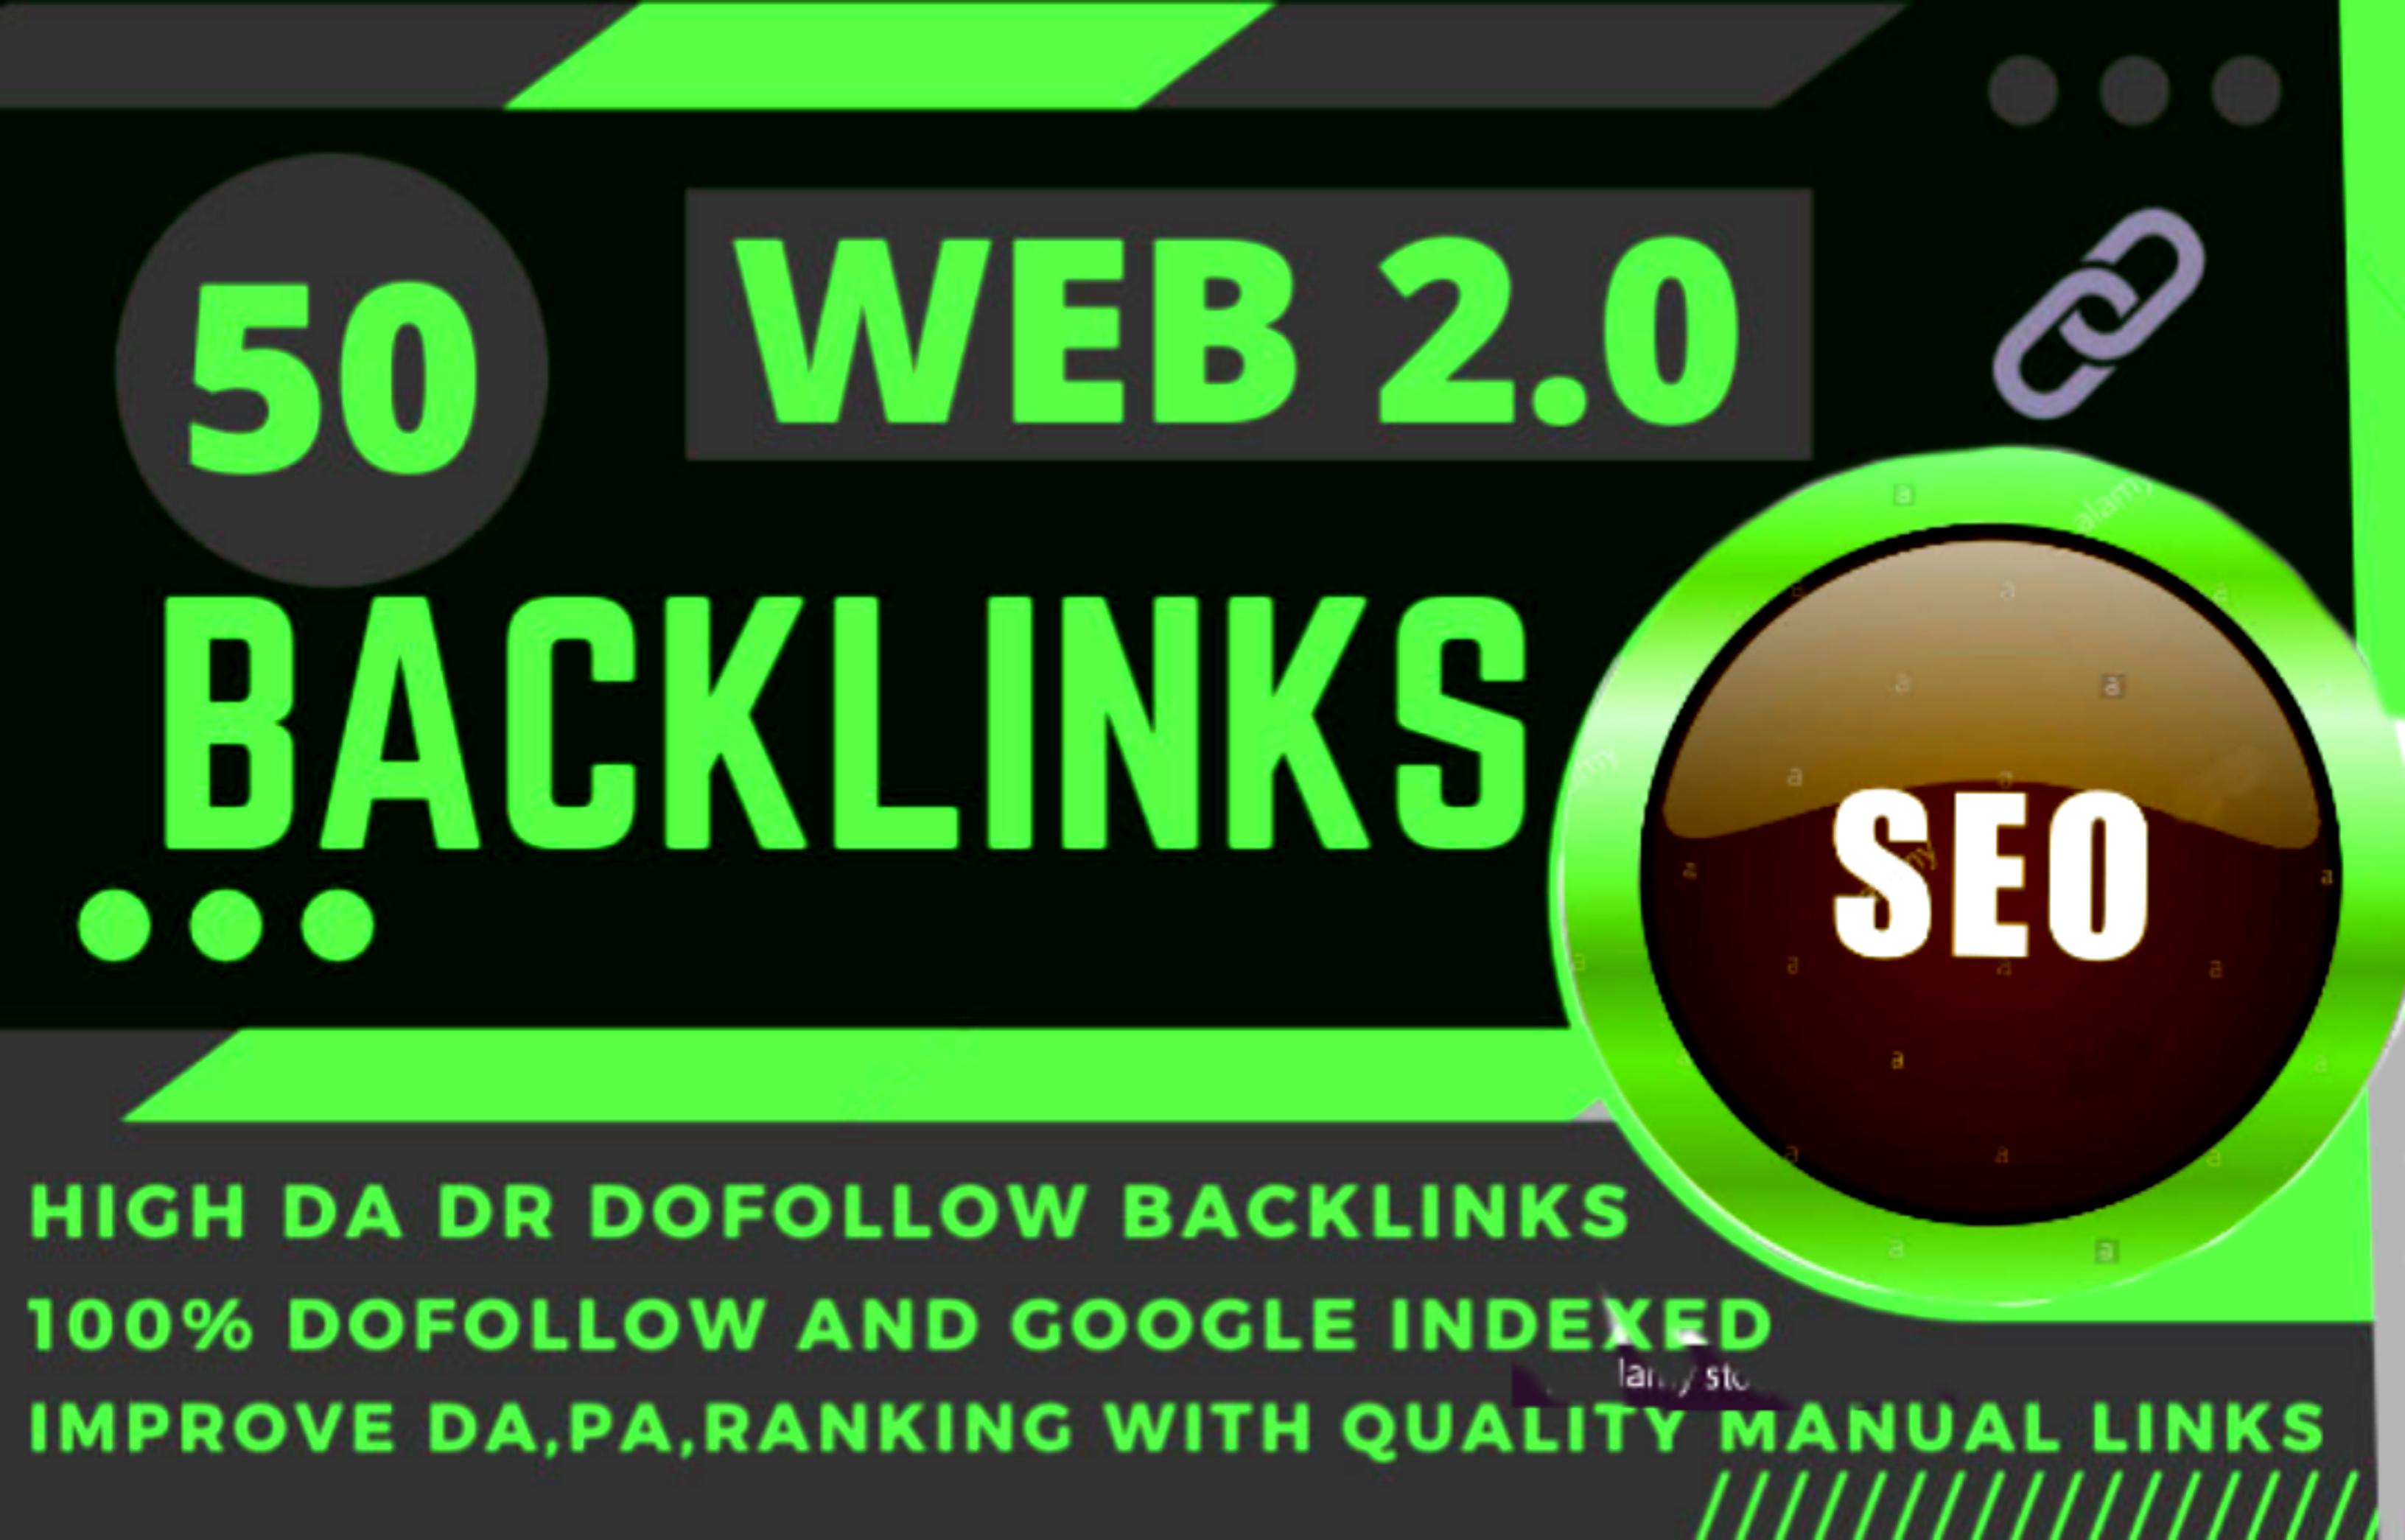 I will make you manually 50 web 2.0 with High DA permanent backlinks